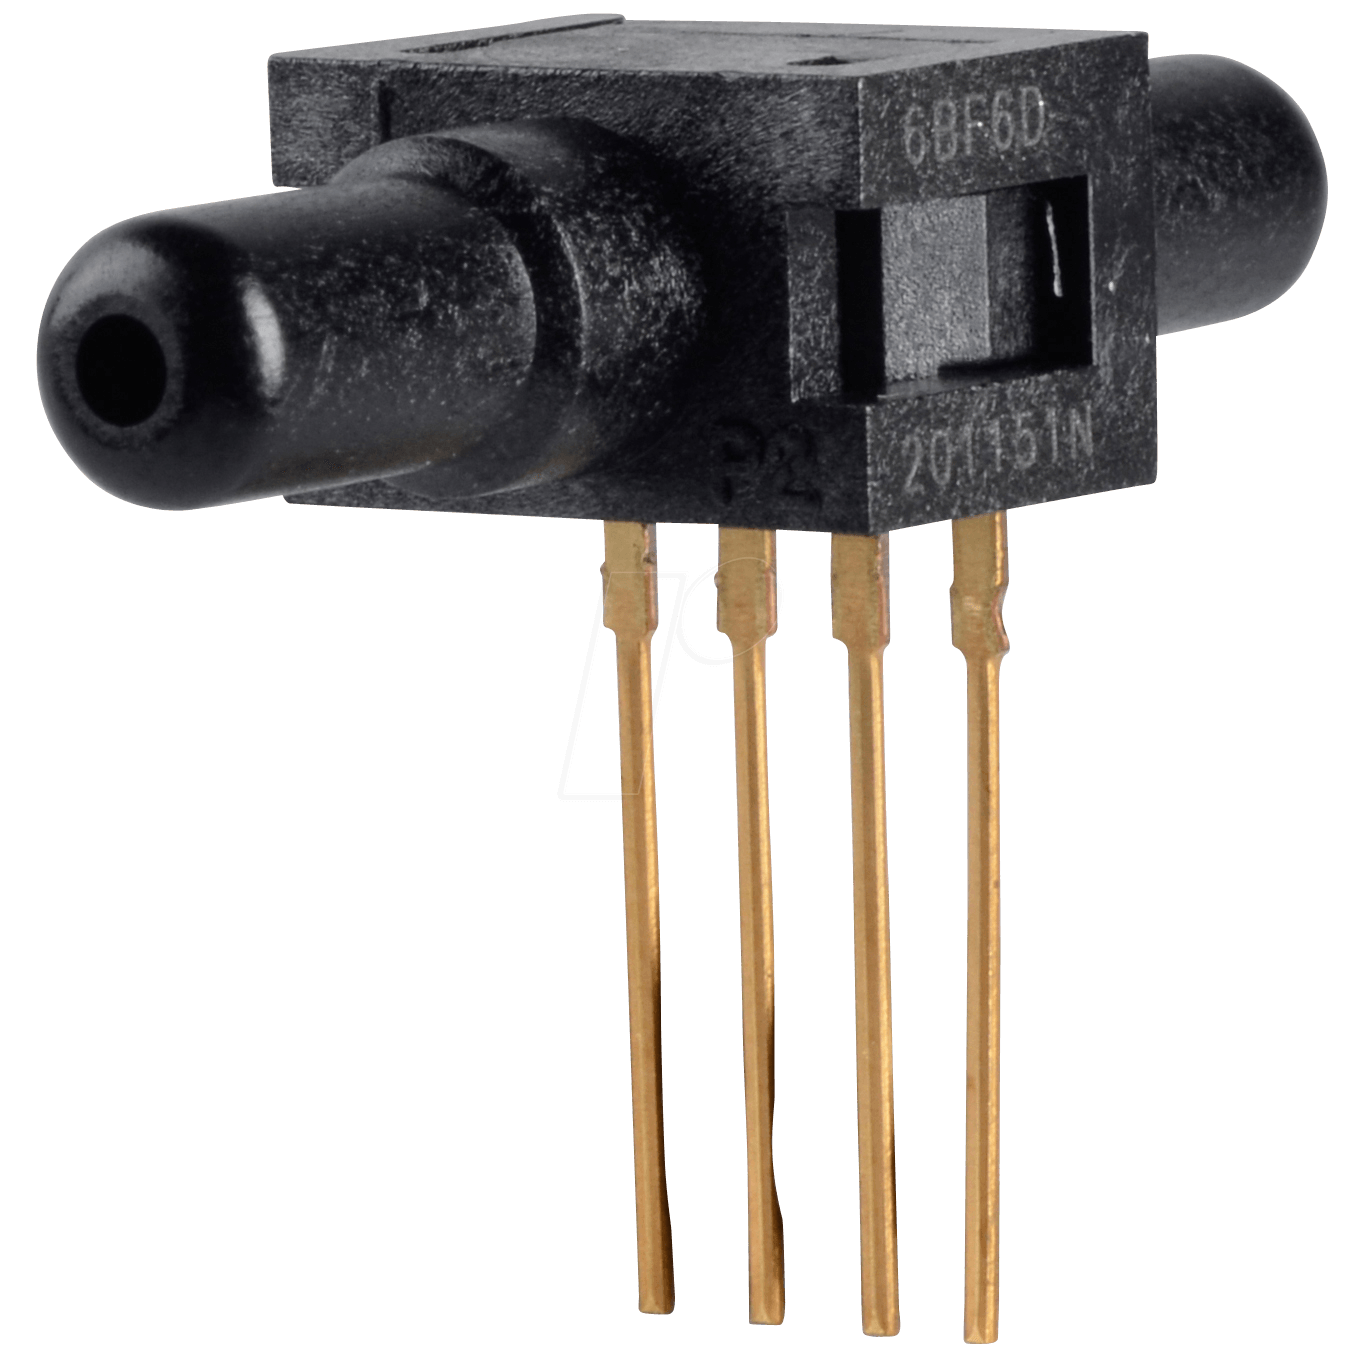 26 PCBFA6D - Differenzdrucksensor, relativ, ± 5 psi